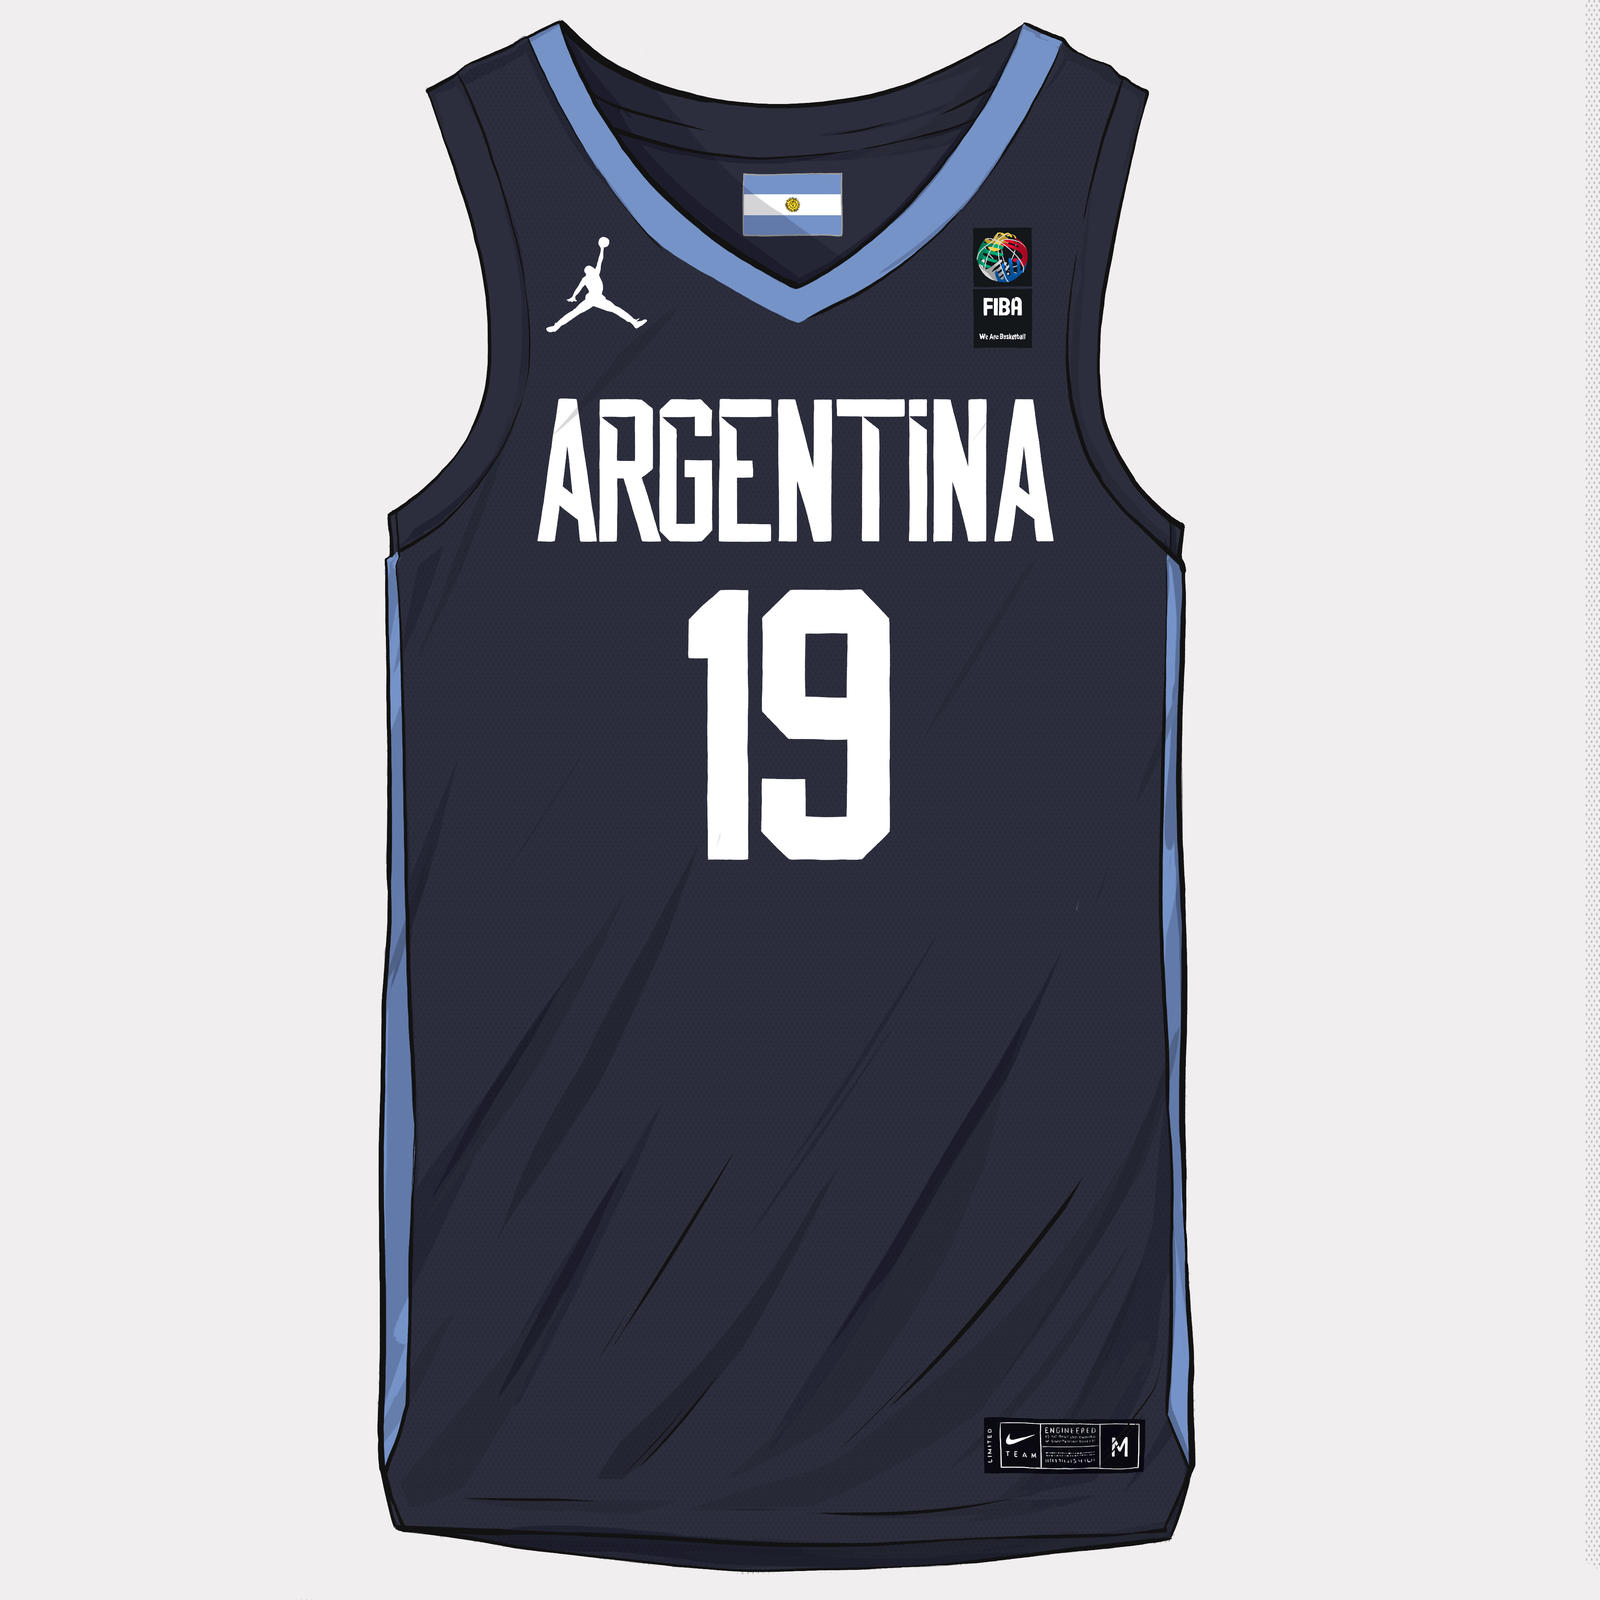 nike-news-argentina-national-team-kit-2019-illustration-1x1_1_square_1600.jpg